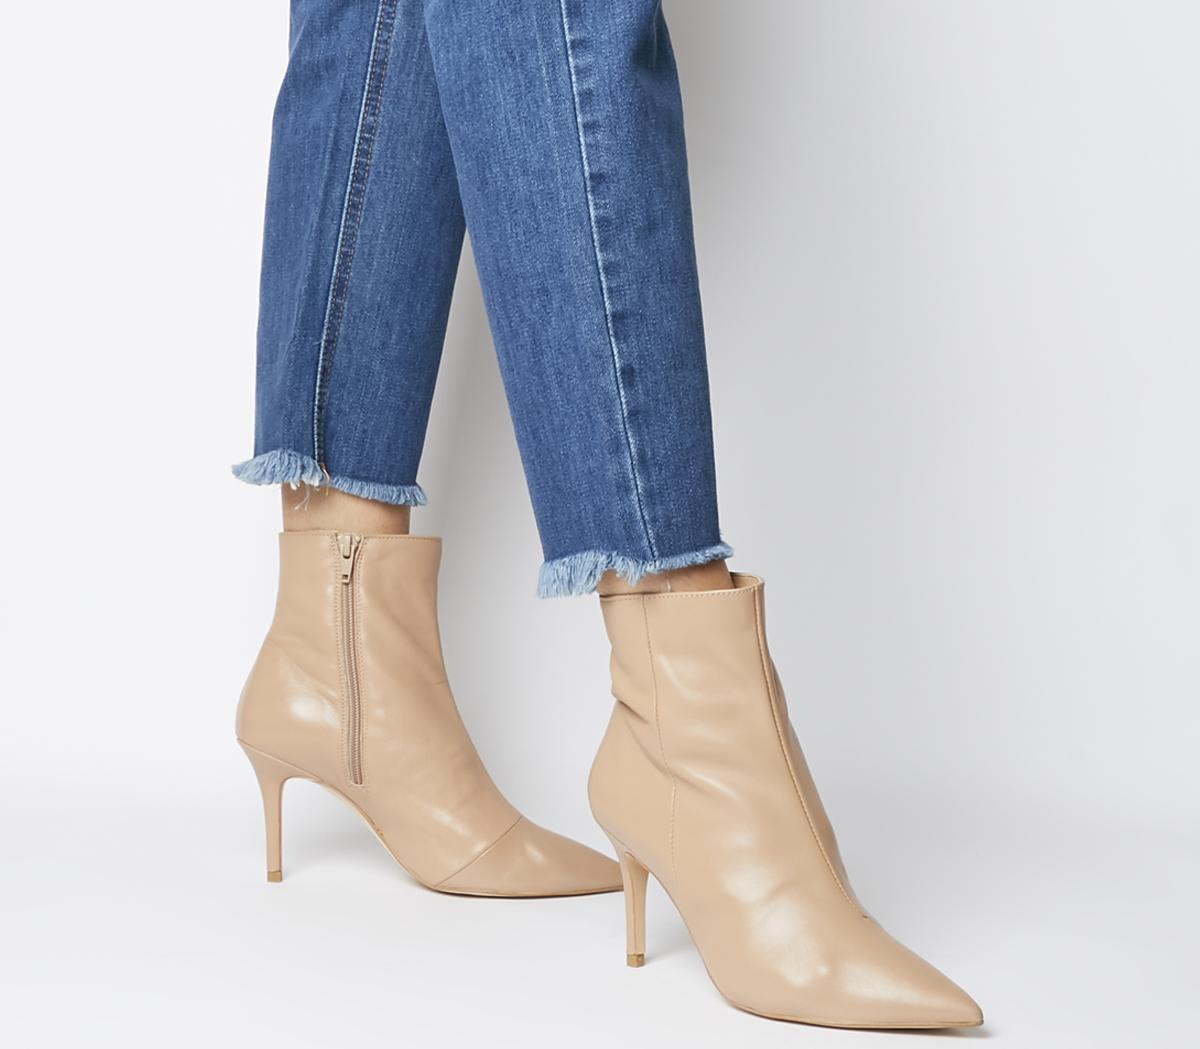 Acquaint Dressy Stiletto Boots